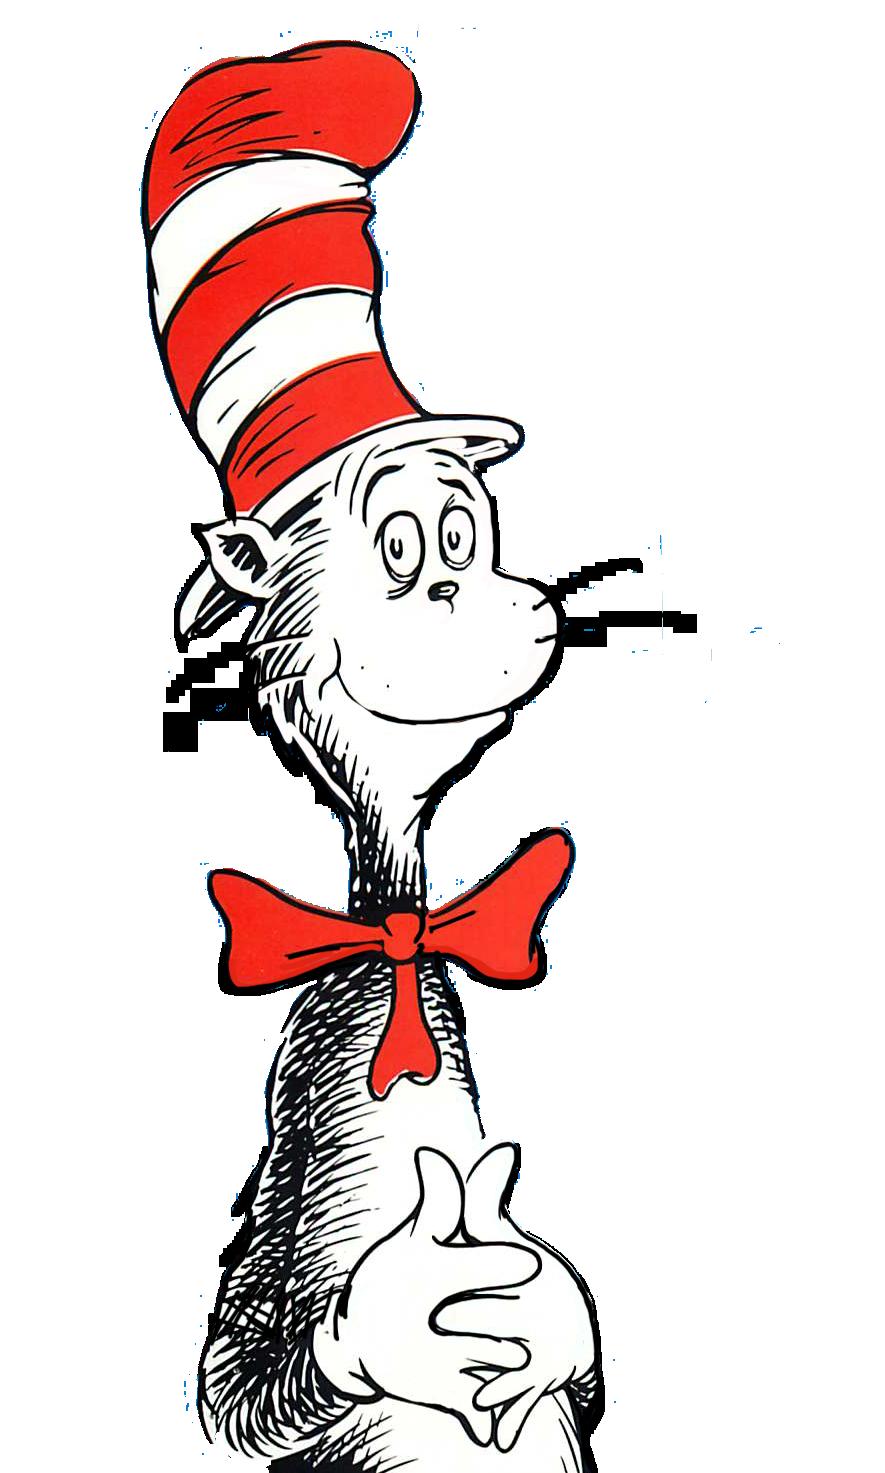 The vs battles wiki. Head clipart cat in hat